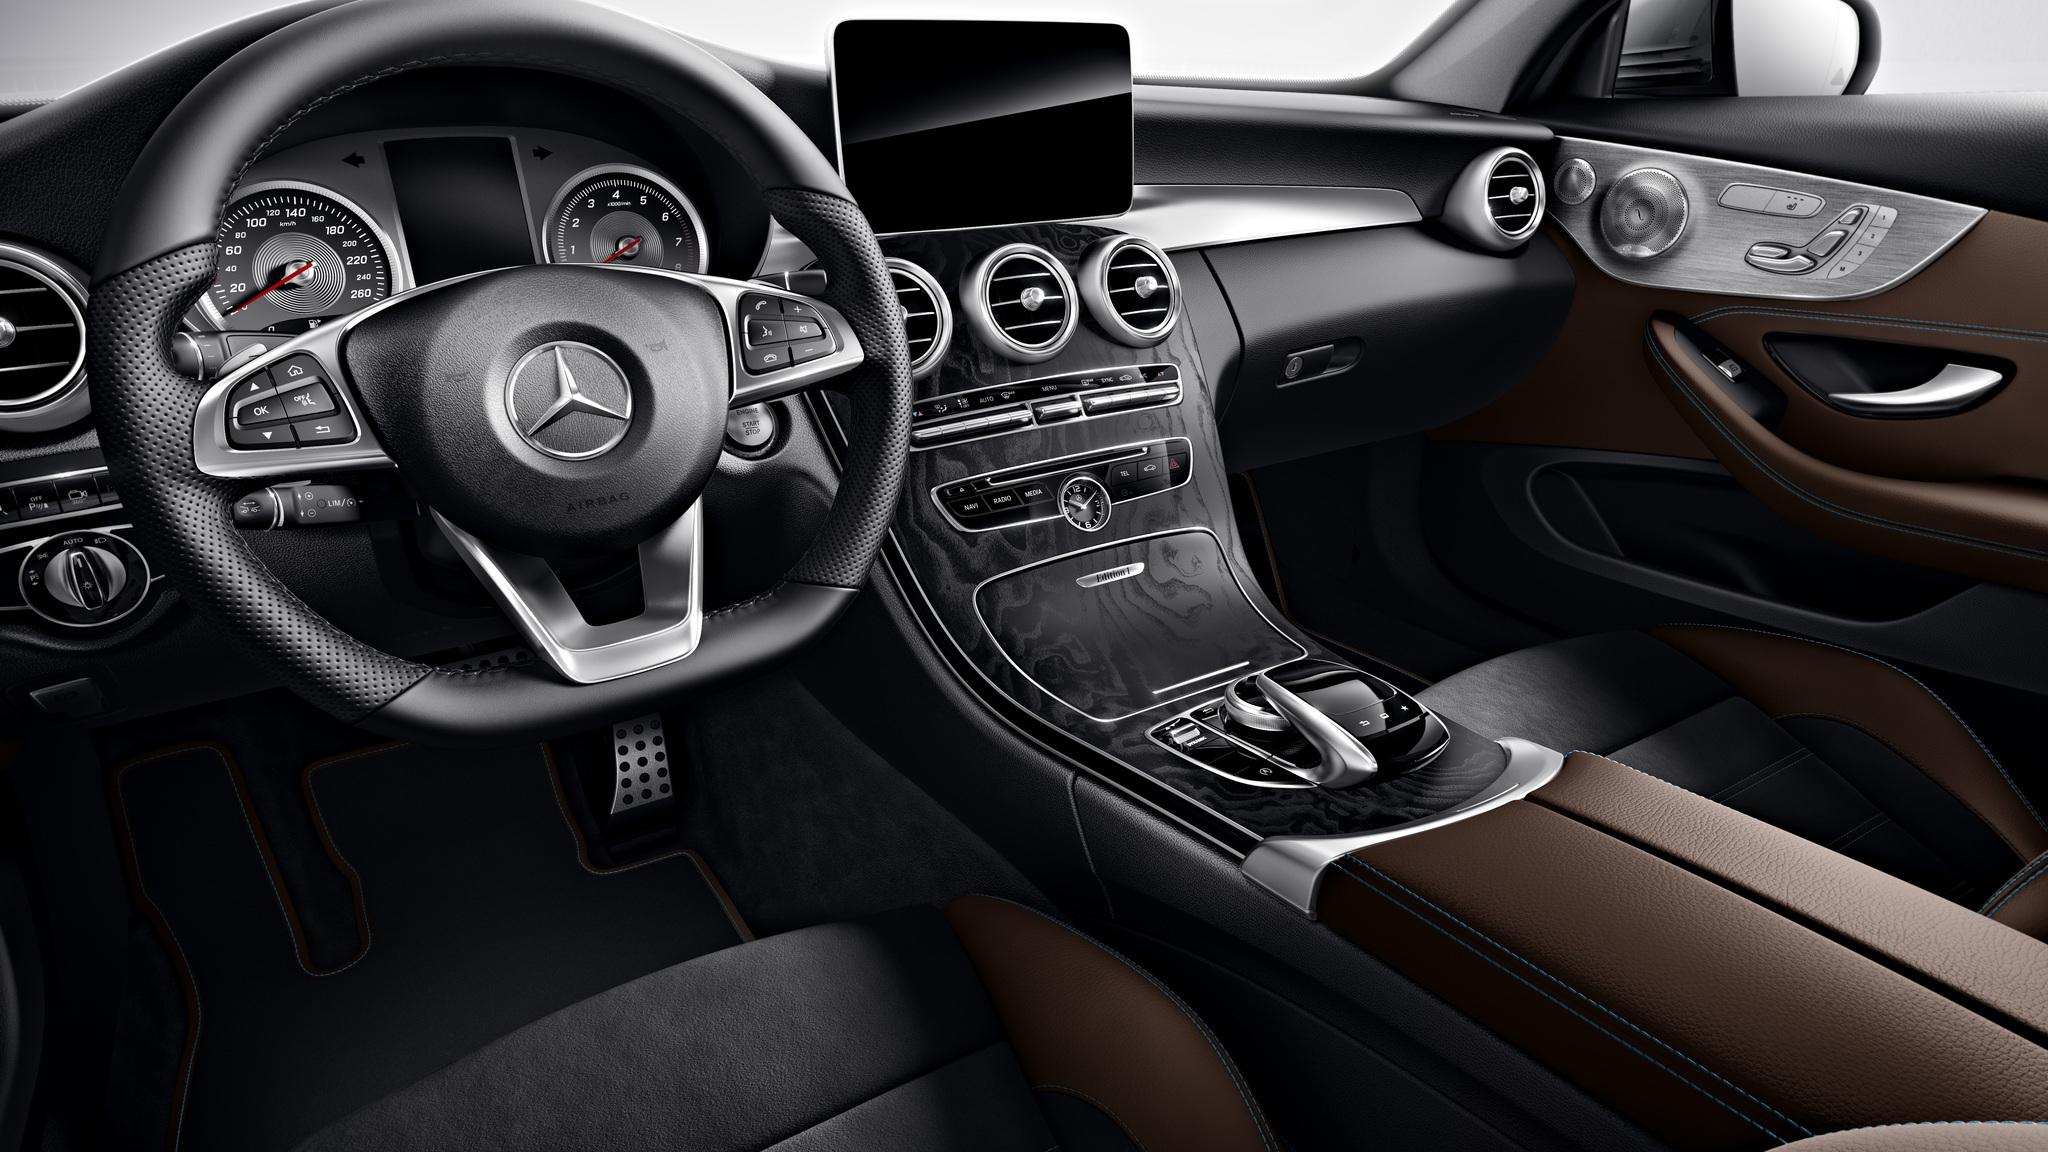 Edition 1 mercedes c63 amg c class coupe frankfurt live - Mercedes benz c class coupe interior ...